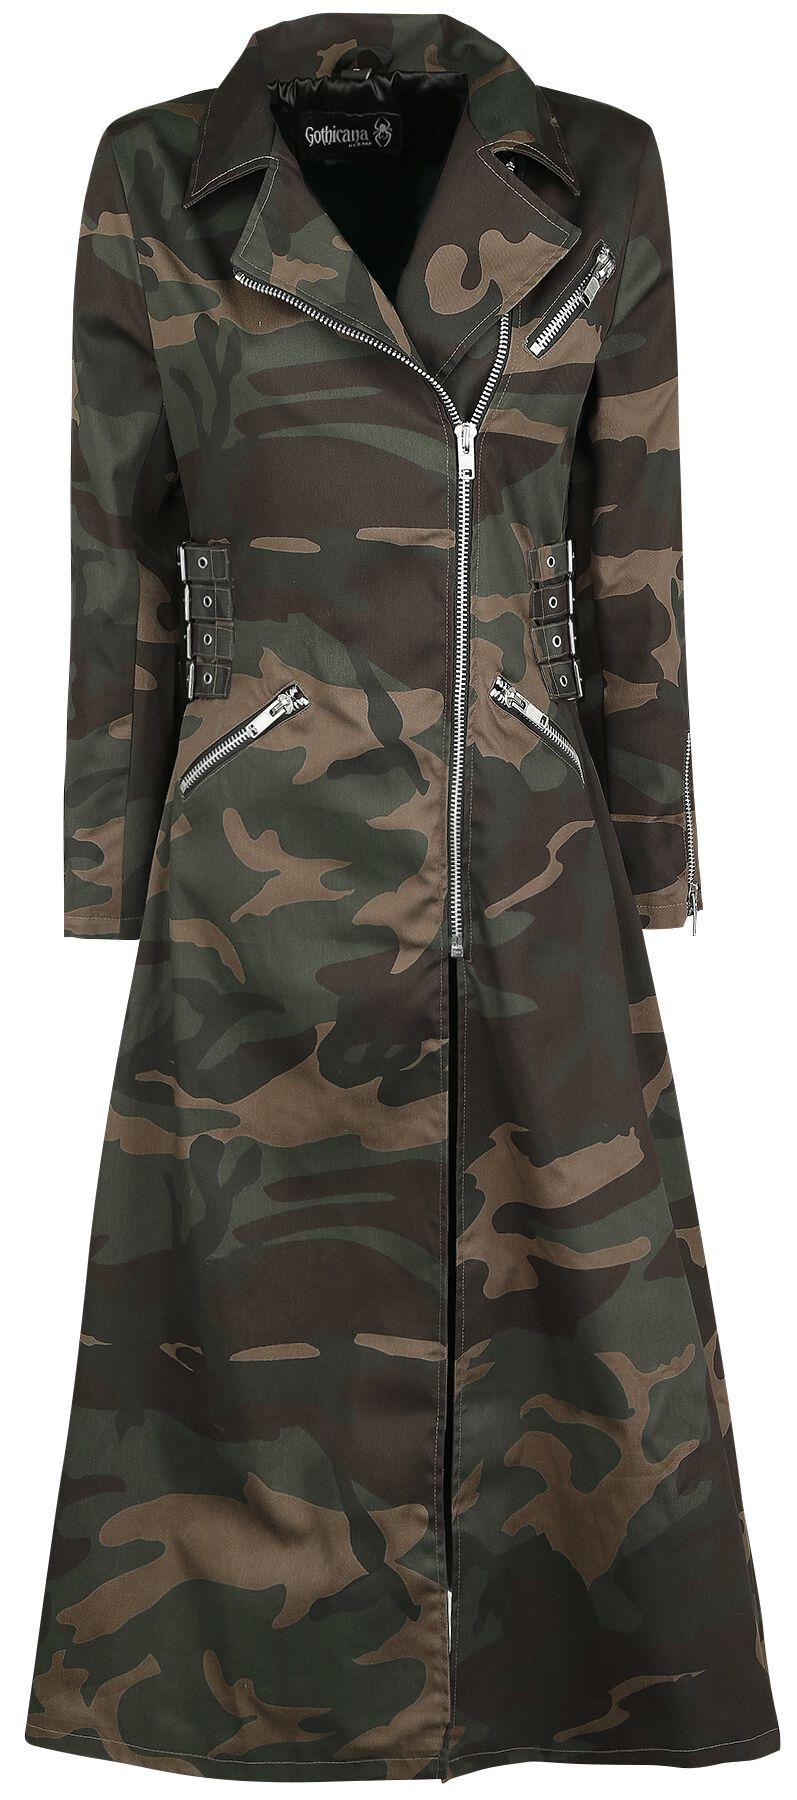 Image of   Gothicana by EMP Duna Girlie frakke camouflage